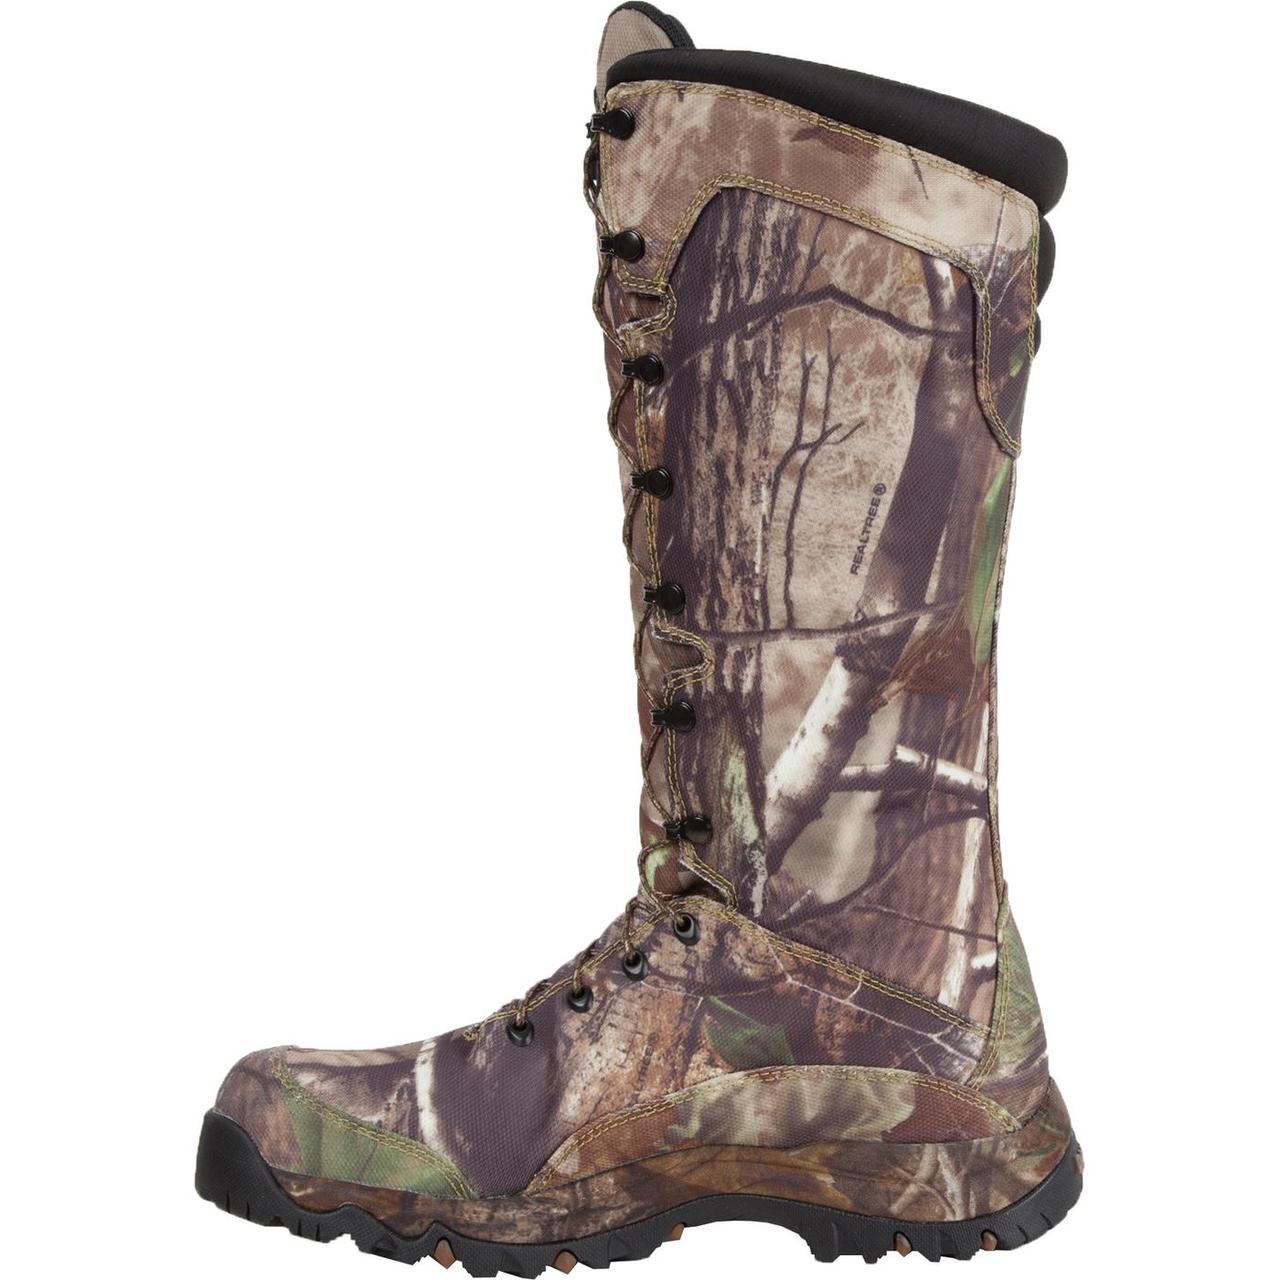 Ботинки для охоты демисезонные Rocky GameSeeker Waterproof Snake Boot